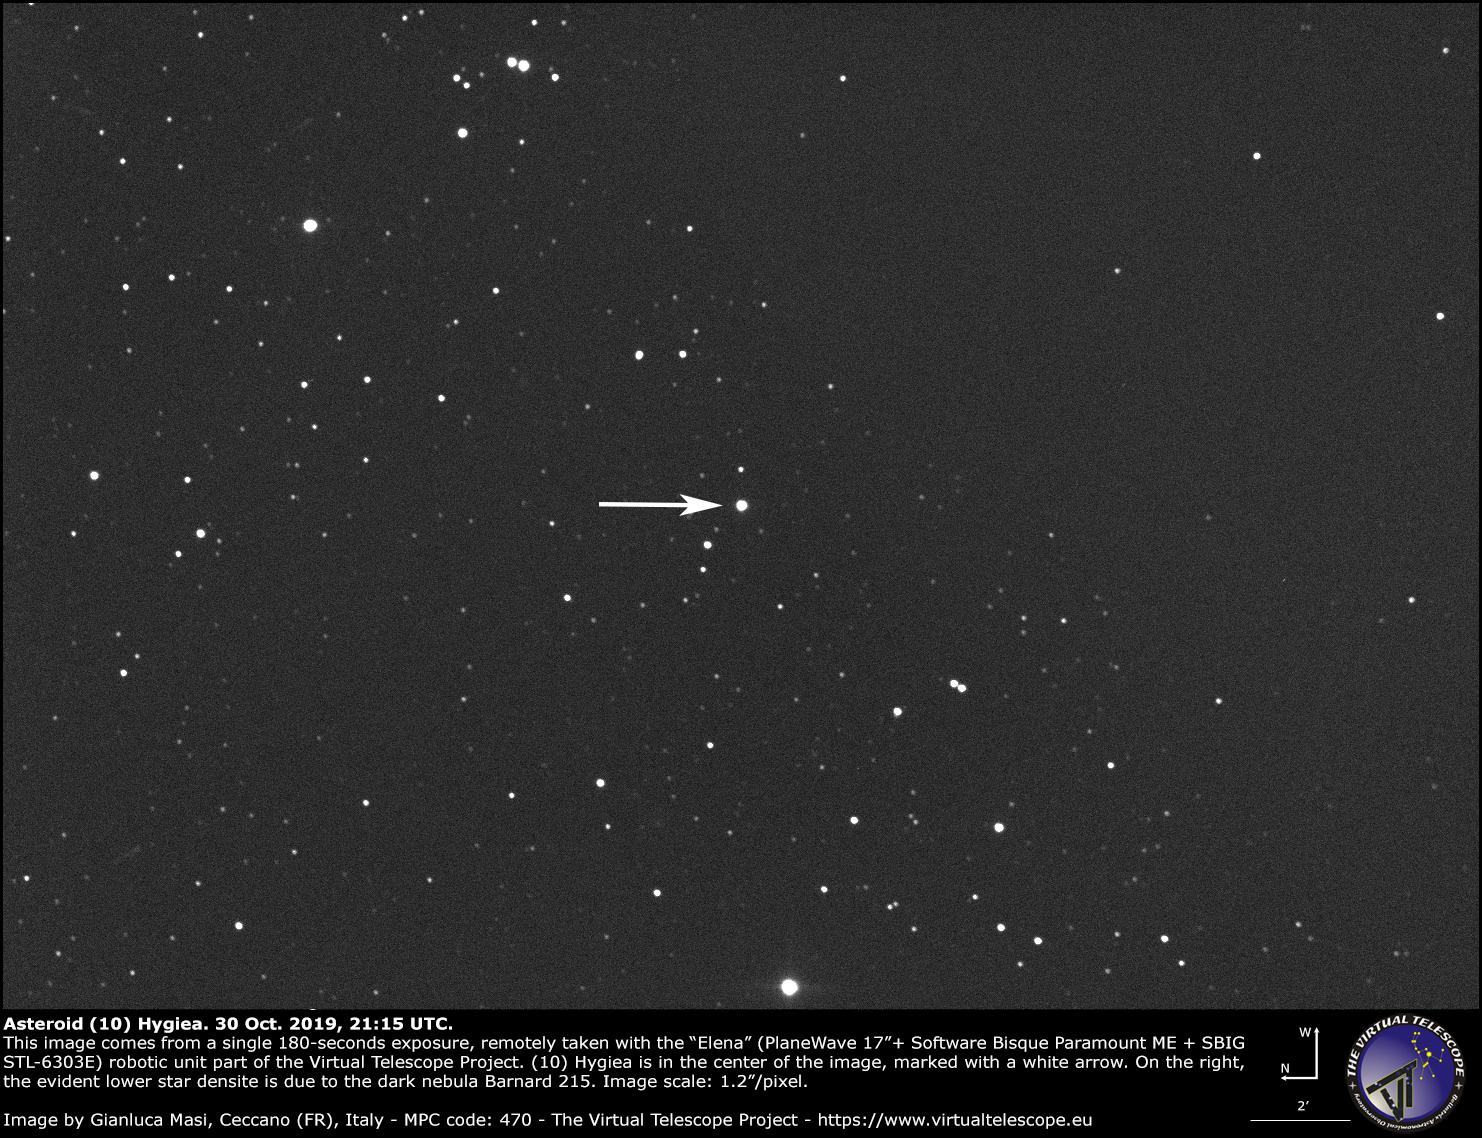 Asteroid (10) Hygiea - 30 Oct. 2019